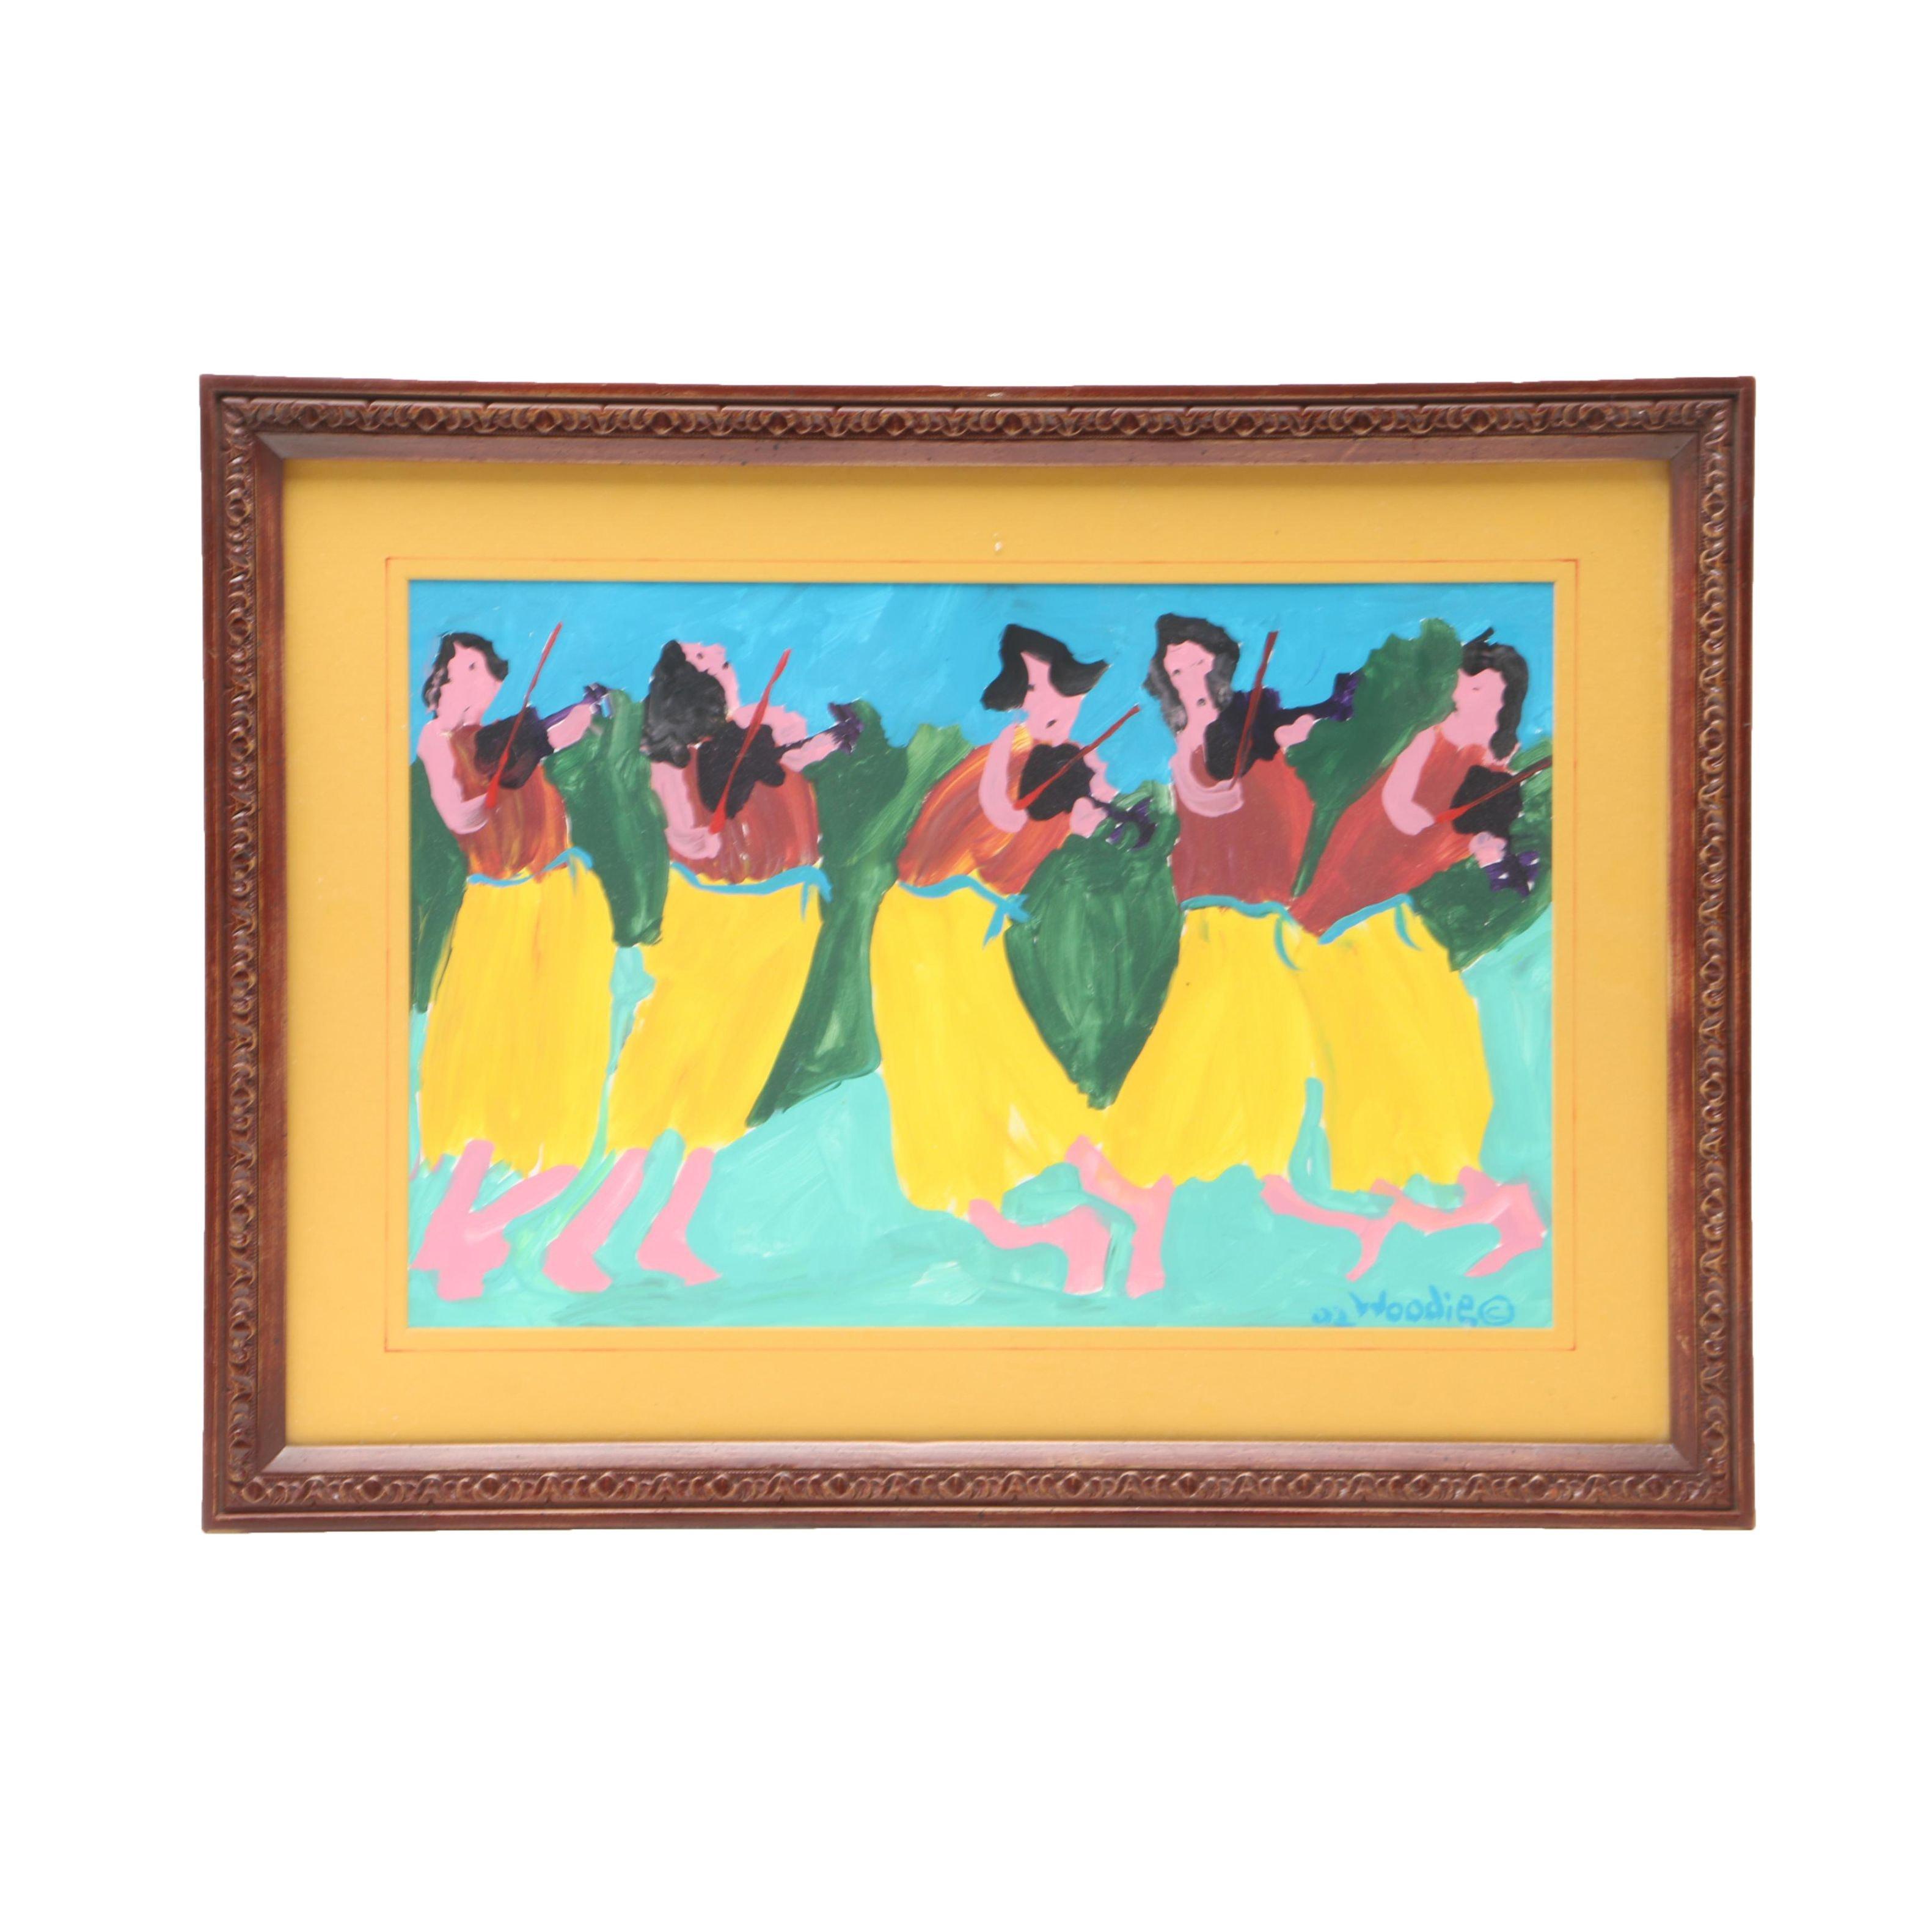 Woodie Long 2002 Gouache Folk Painting on Paper